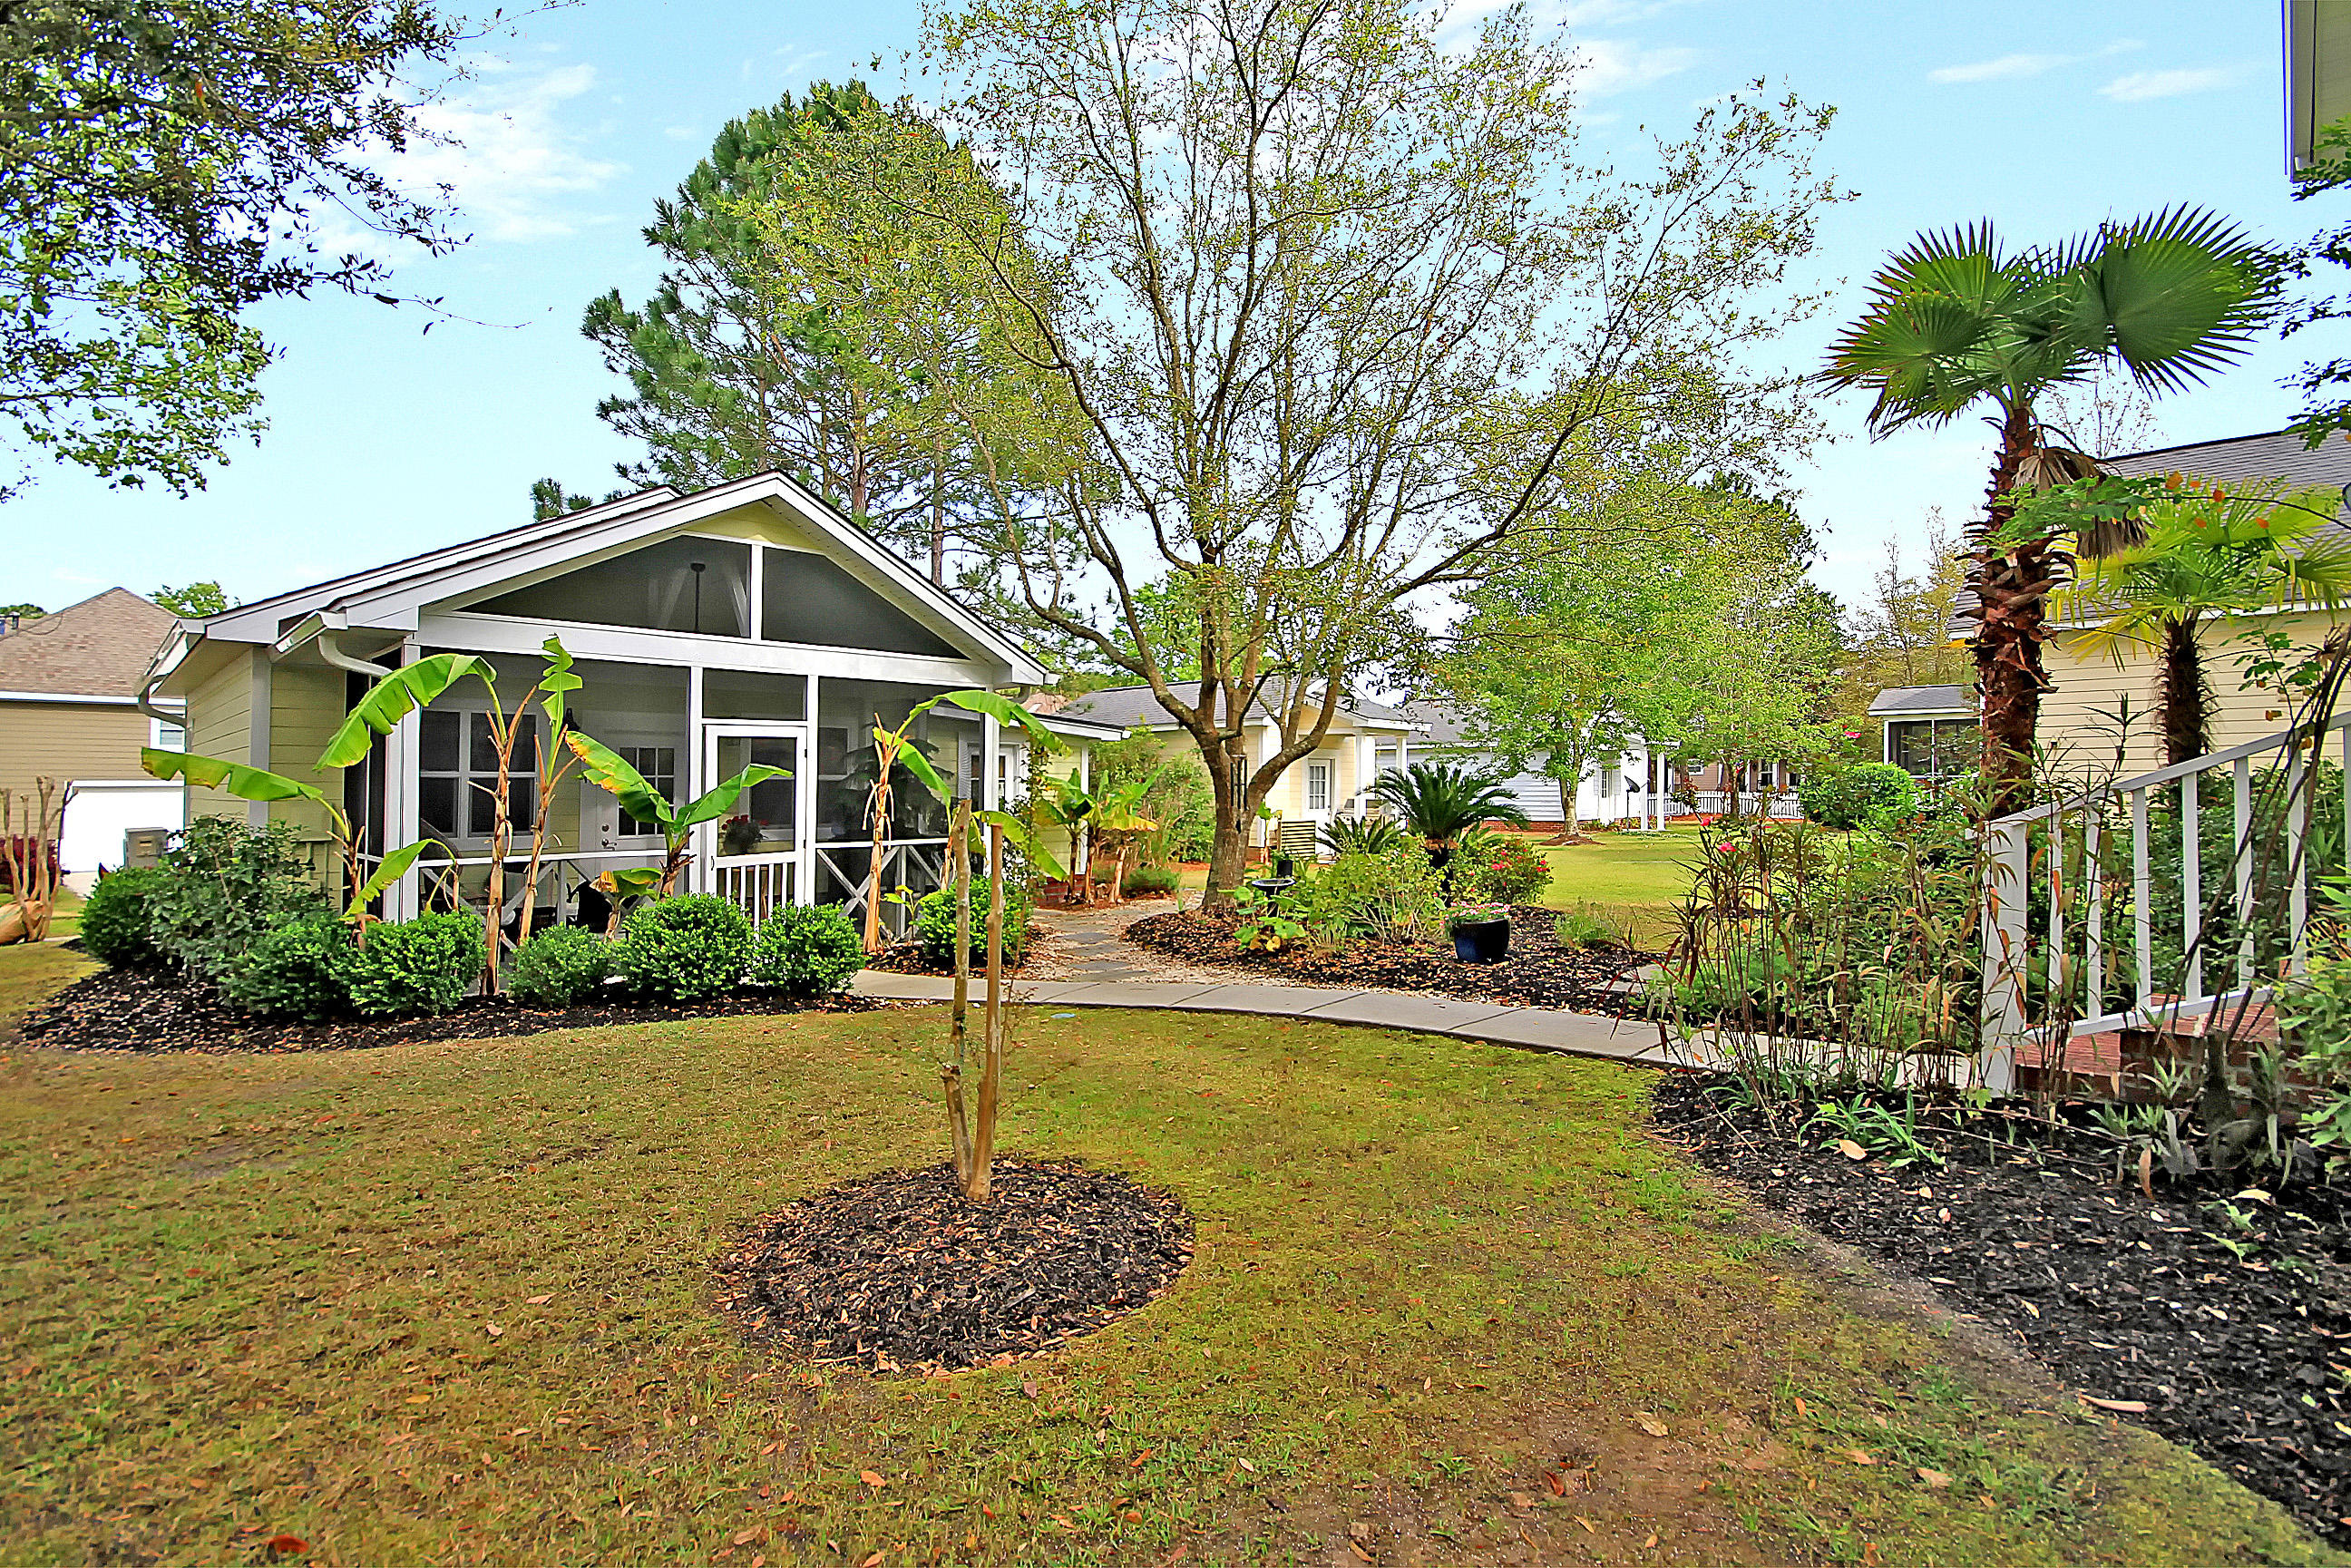 Daniel Island Homes For Sale - 1404 Elfe, Daniel Island, SC - 4